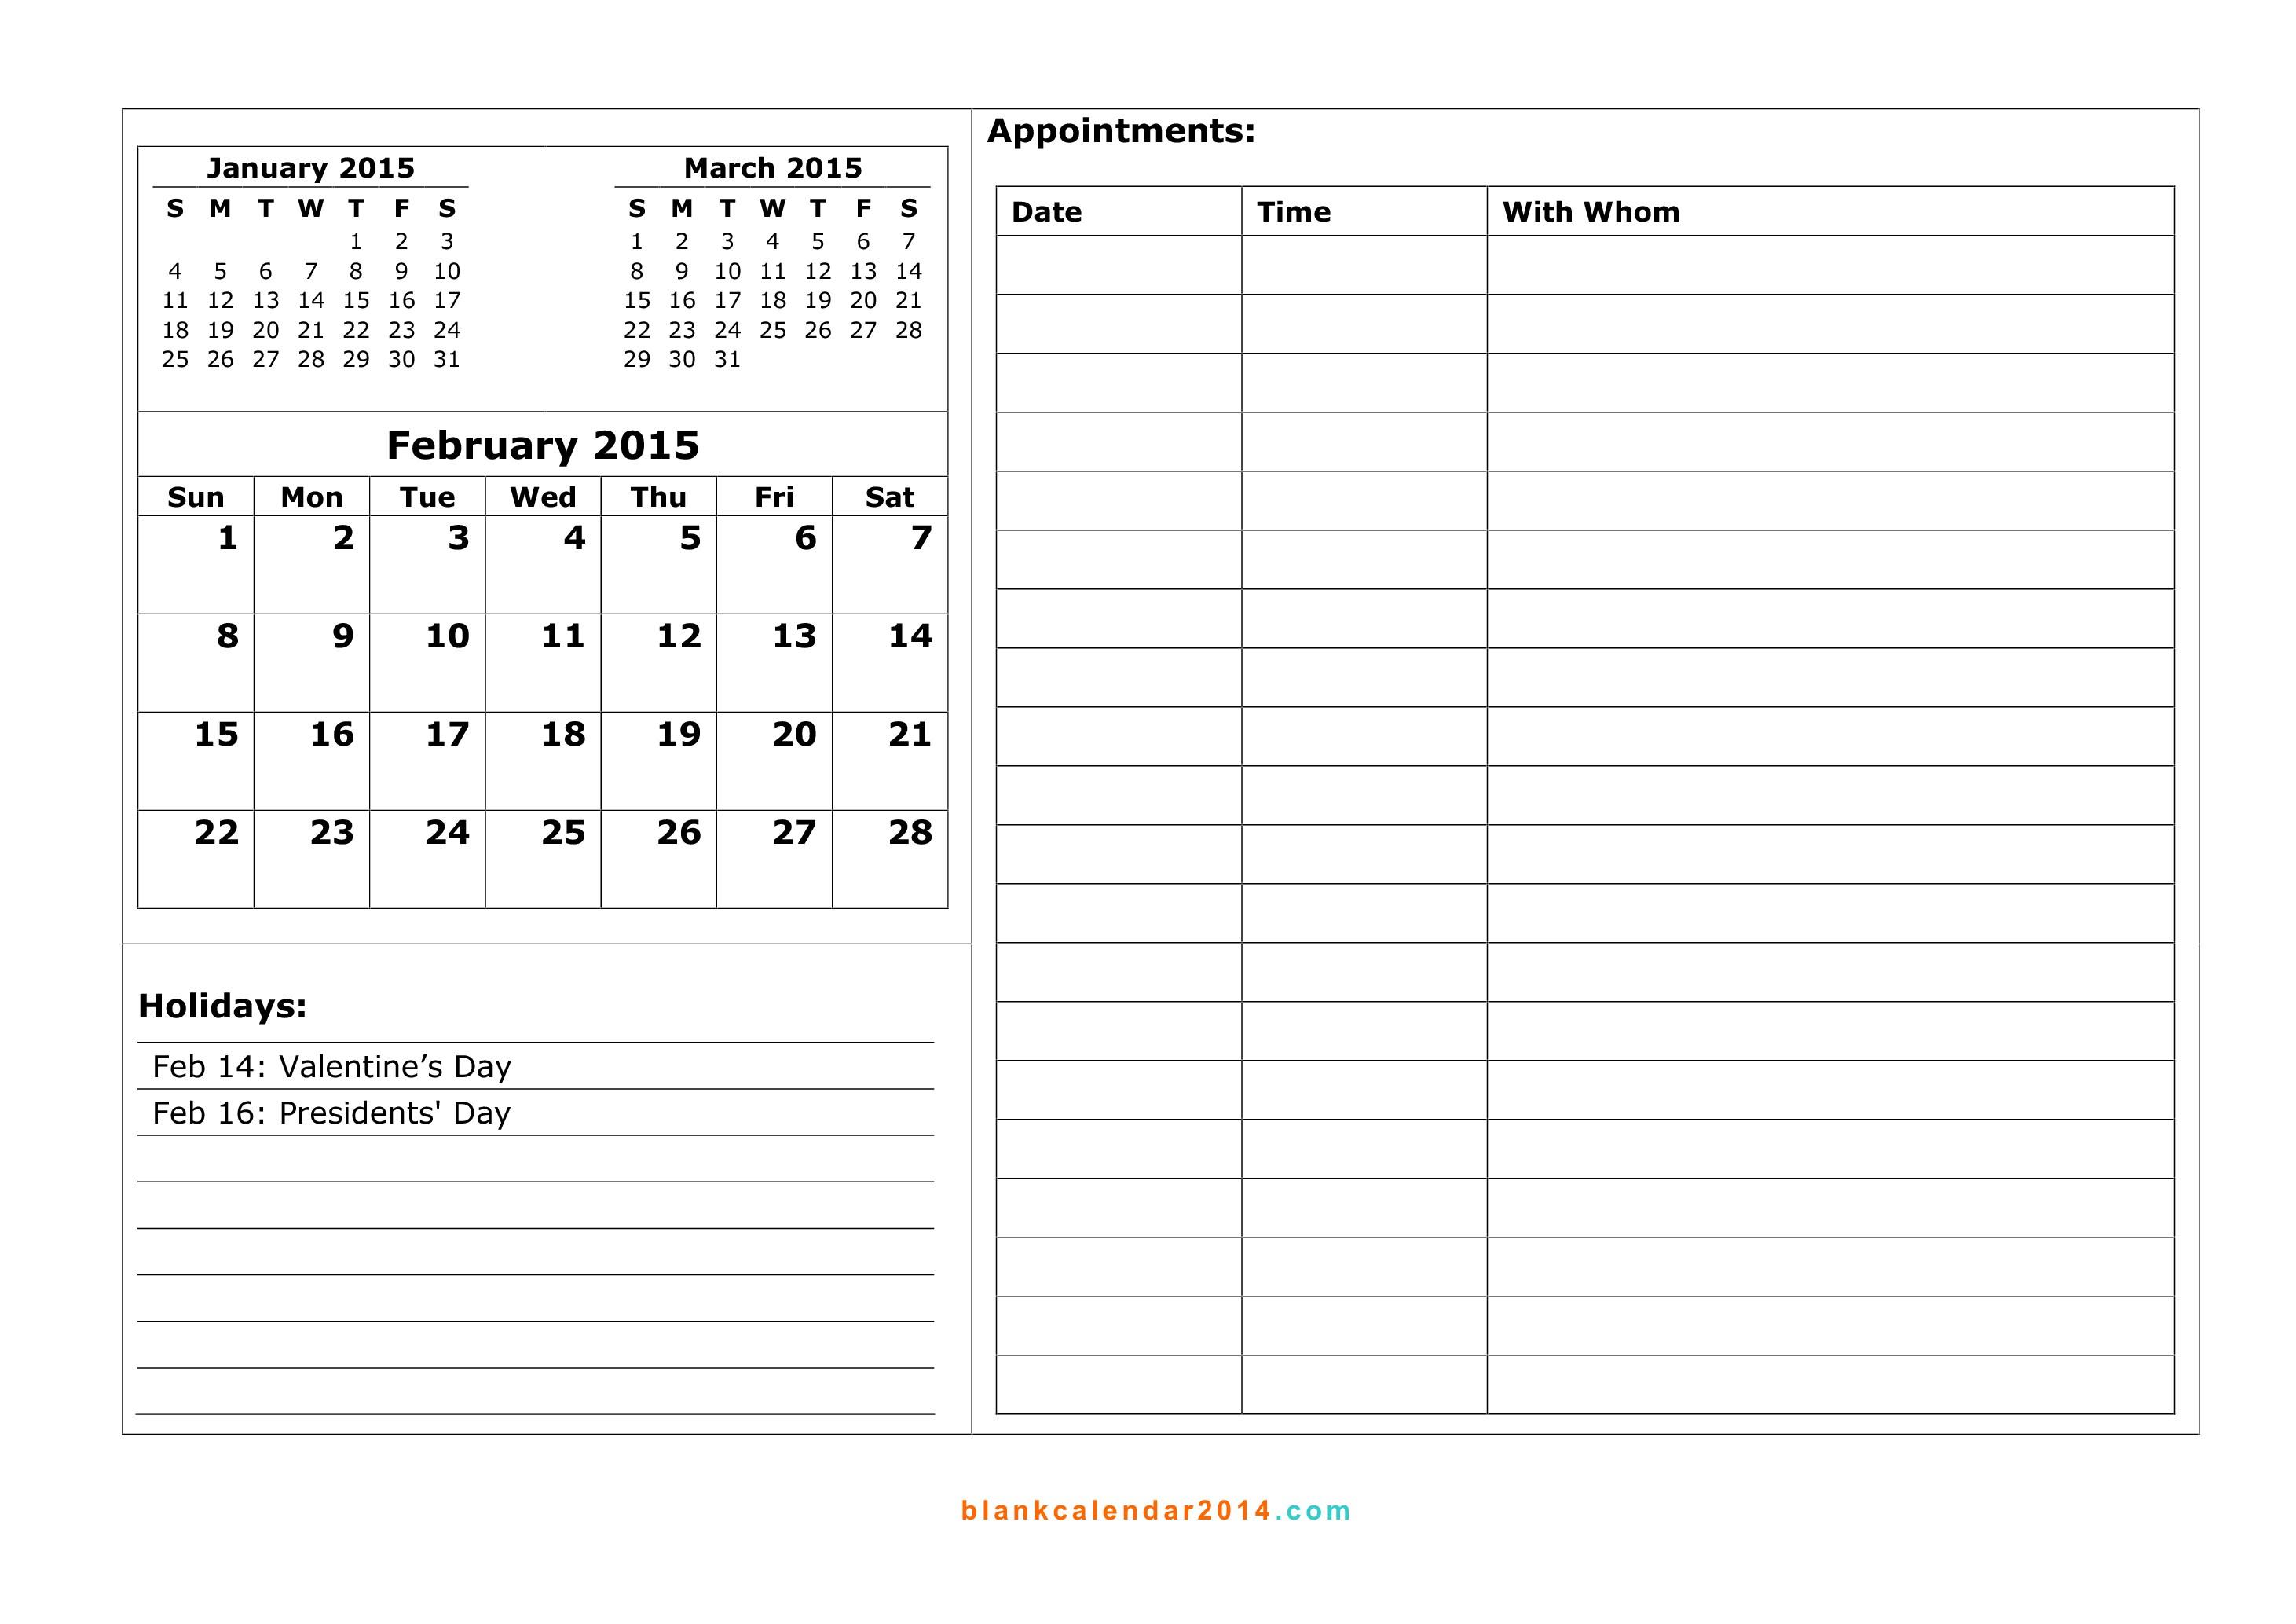 Blank Calendar 2014.com